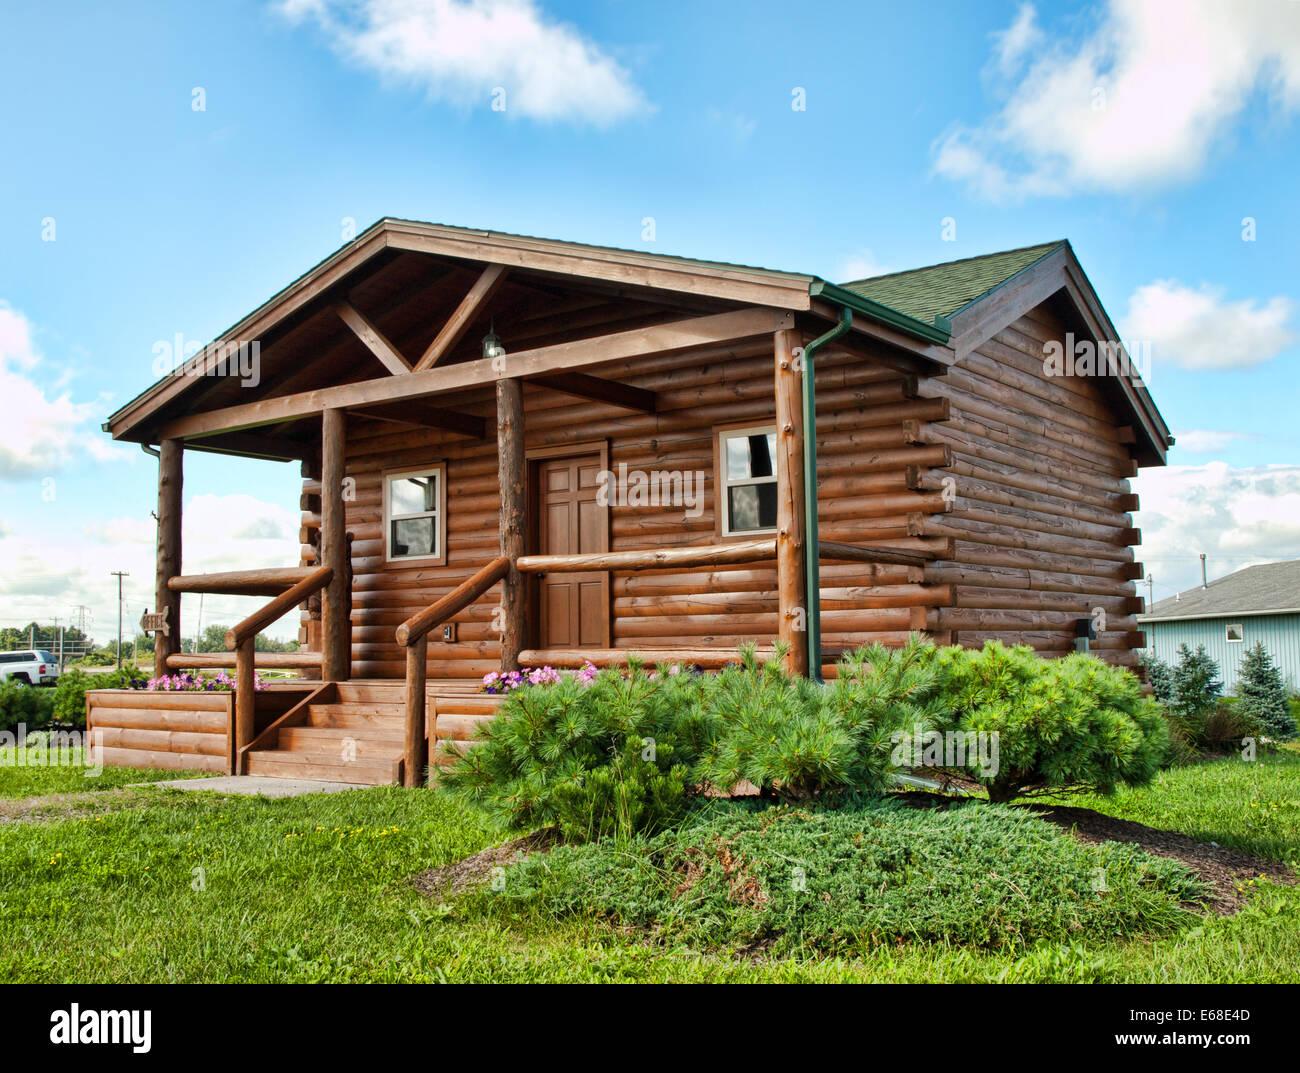 log cabin - Stock Image